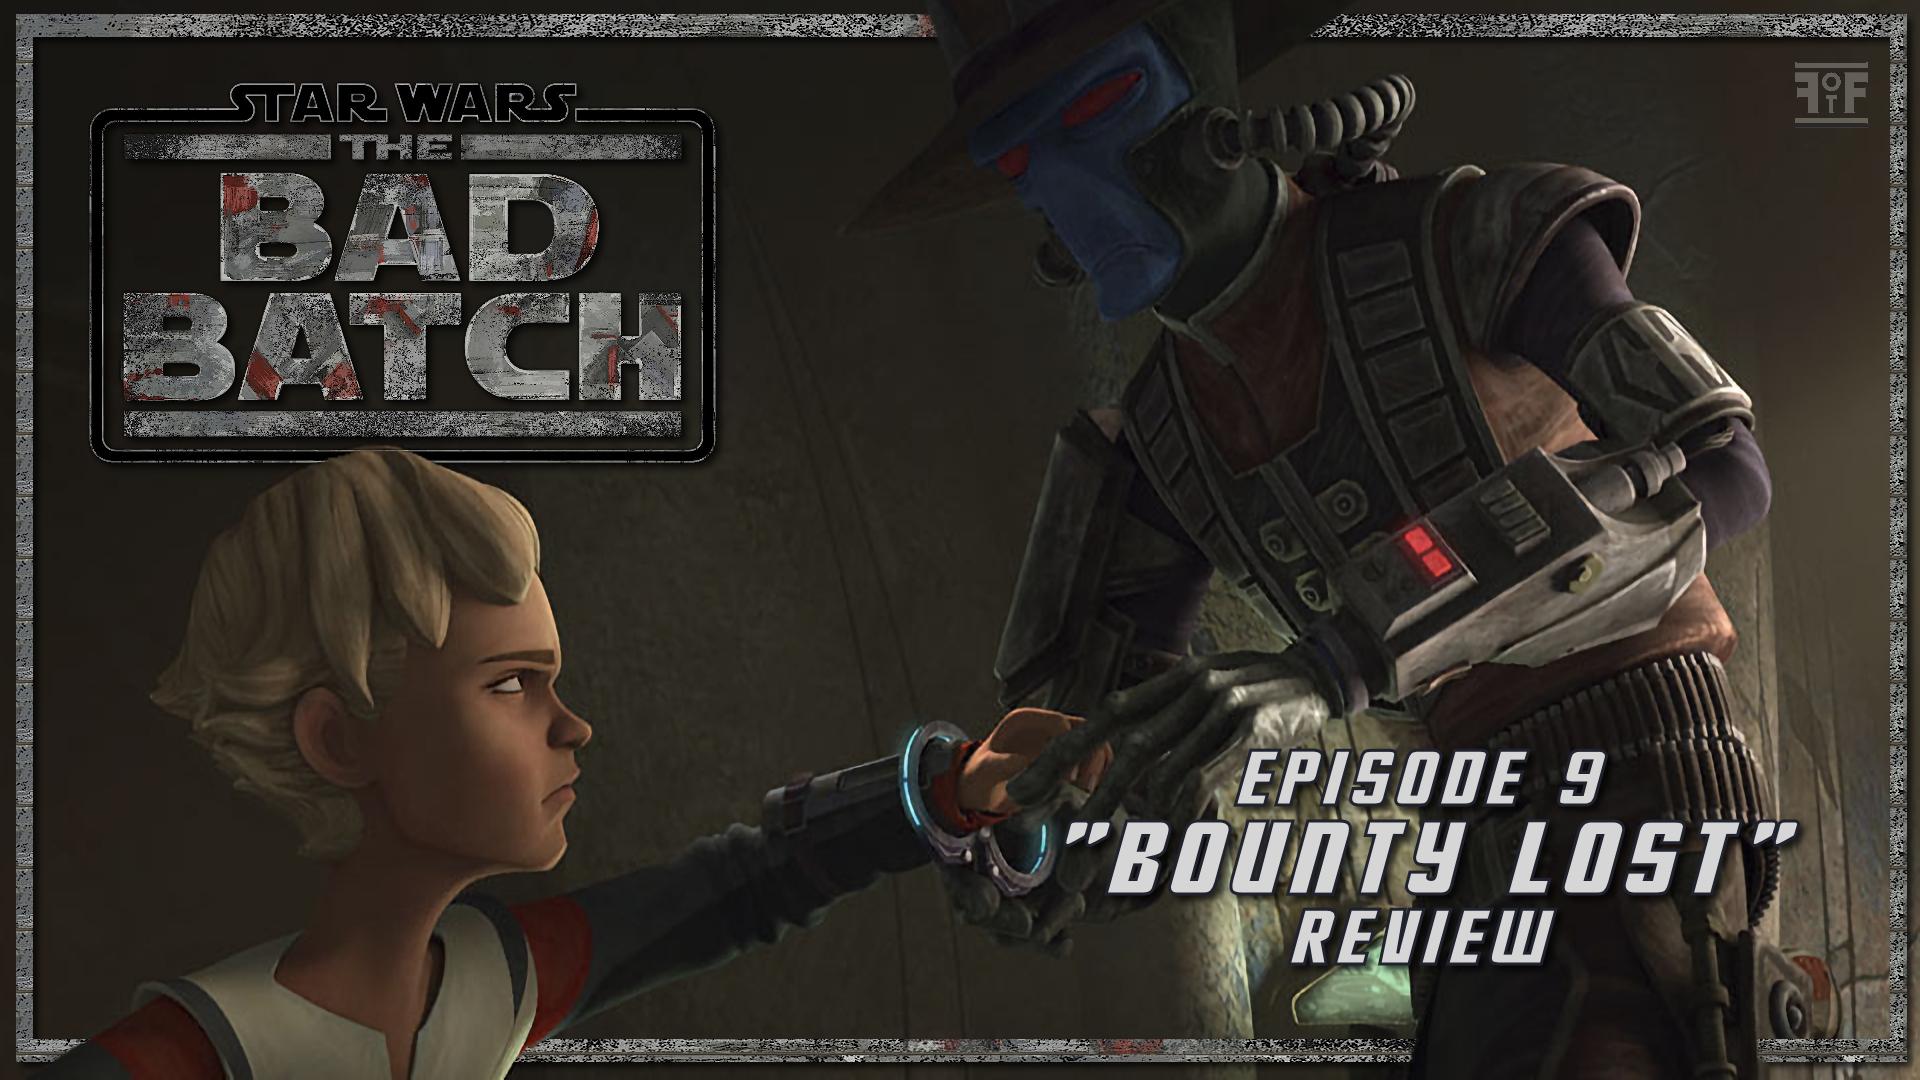 Star Wars: The Bad Batch (Episode 9: Bounty Lost)